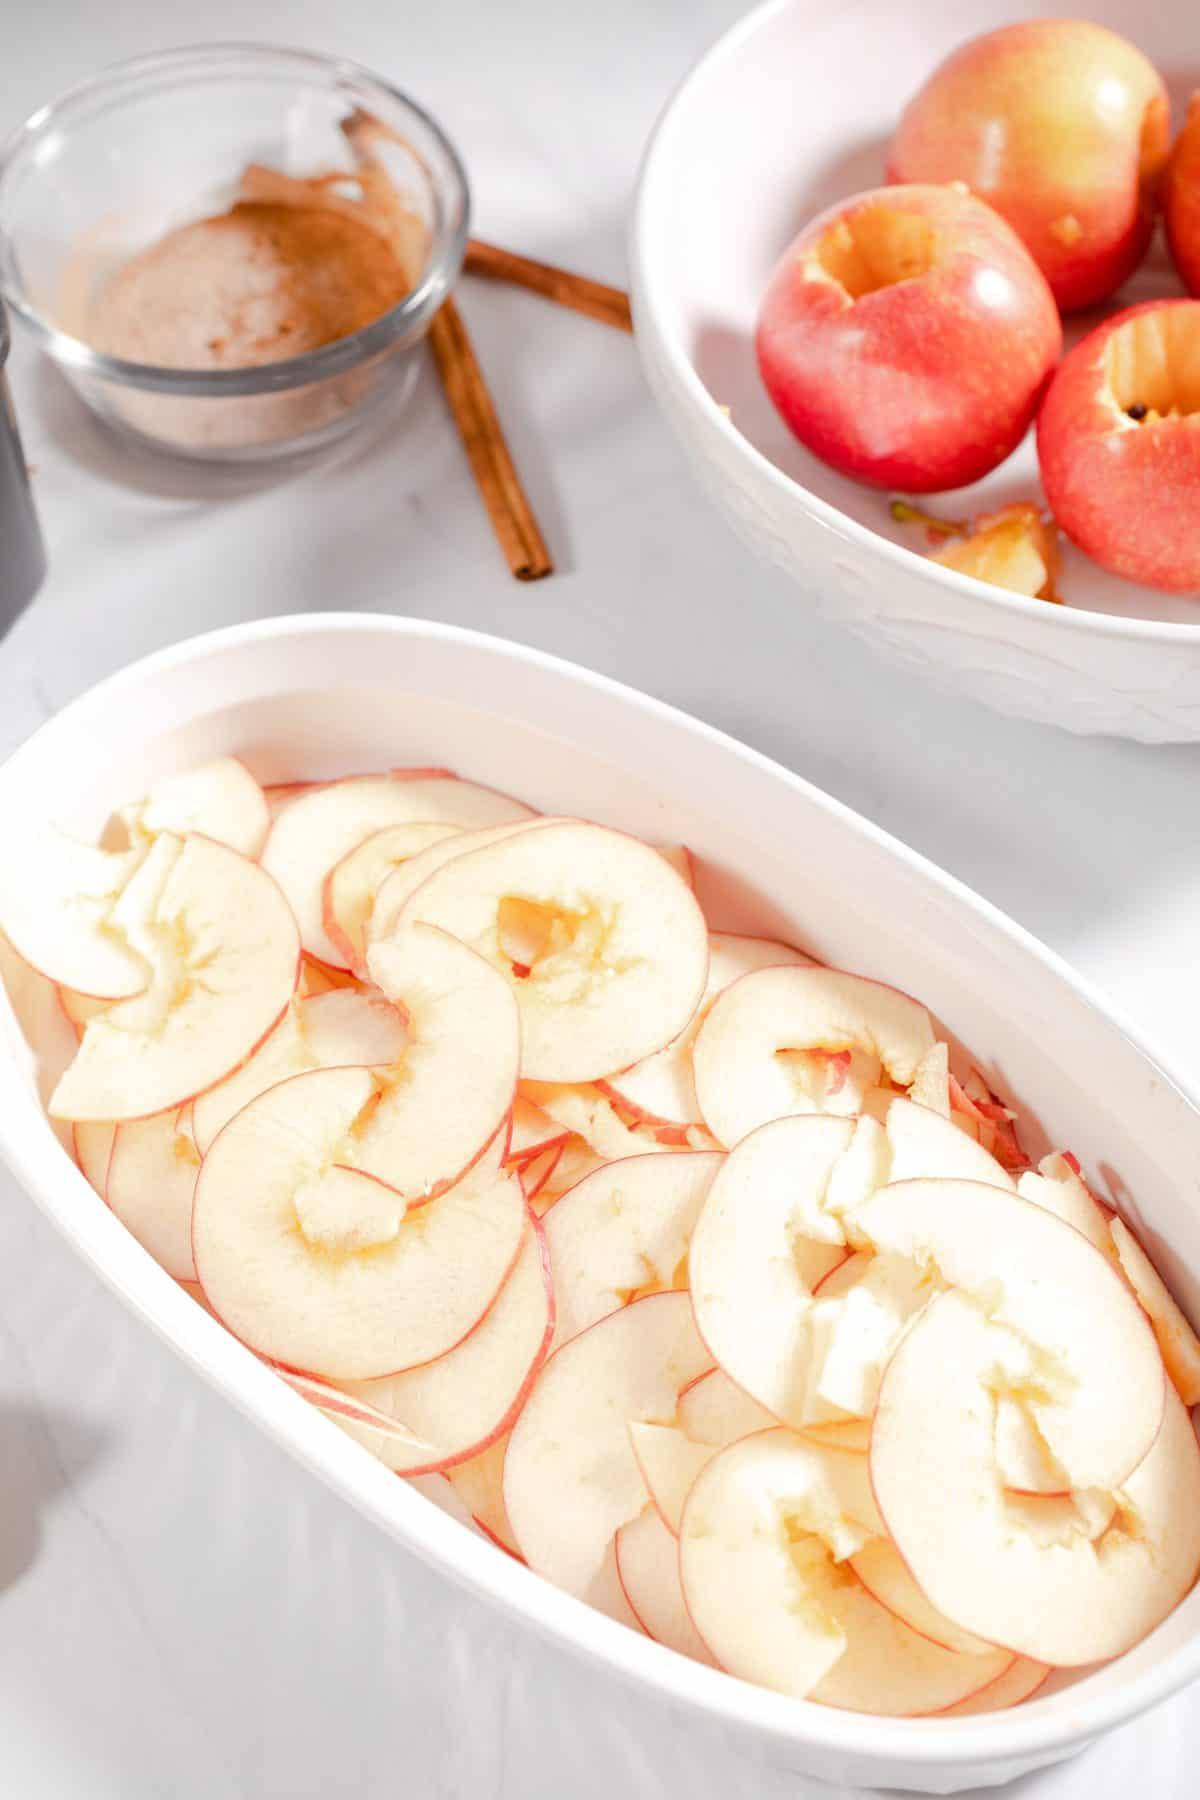 Slice Apples into Slices